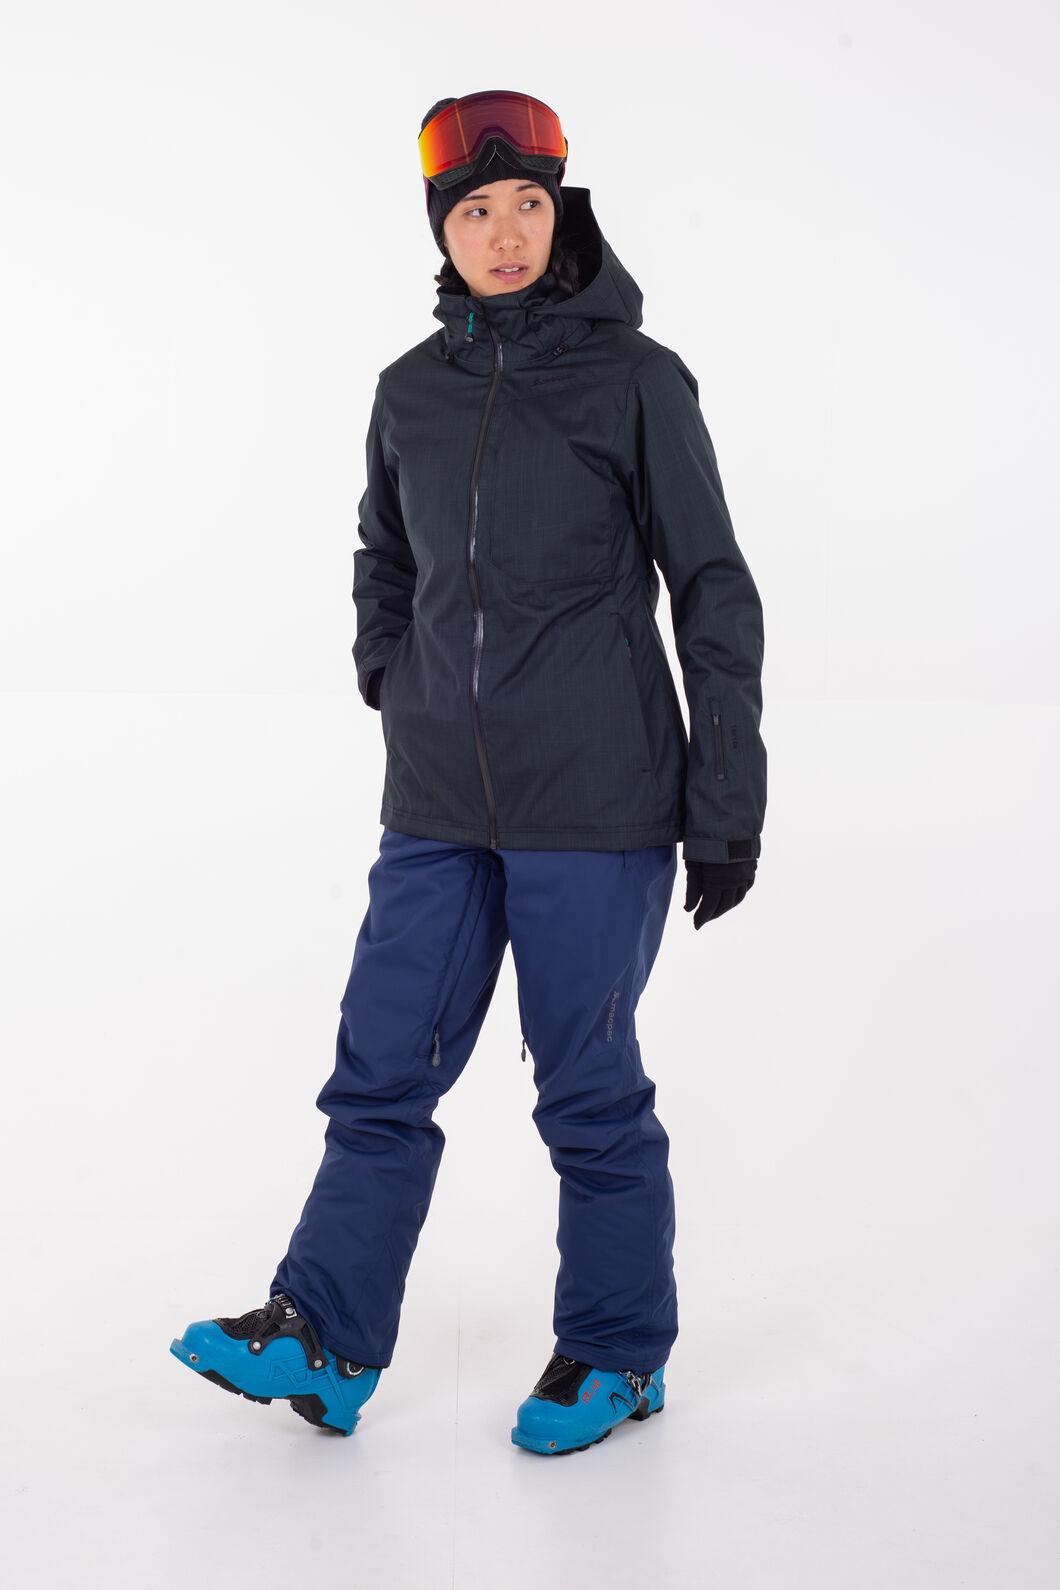 Macpac Powder Ski Jacket - Women's, Black/Black, hi-res